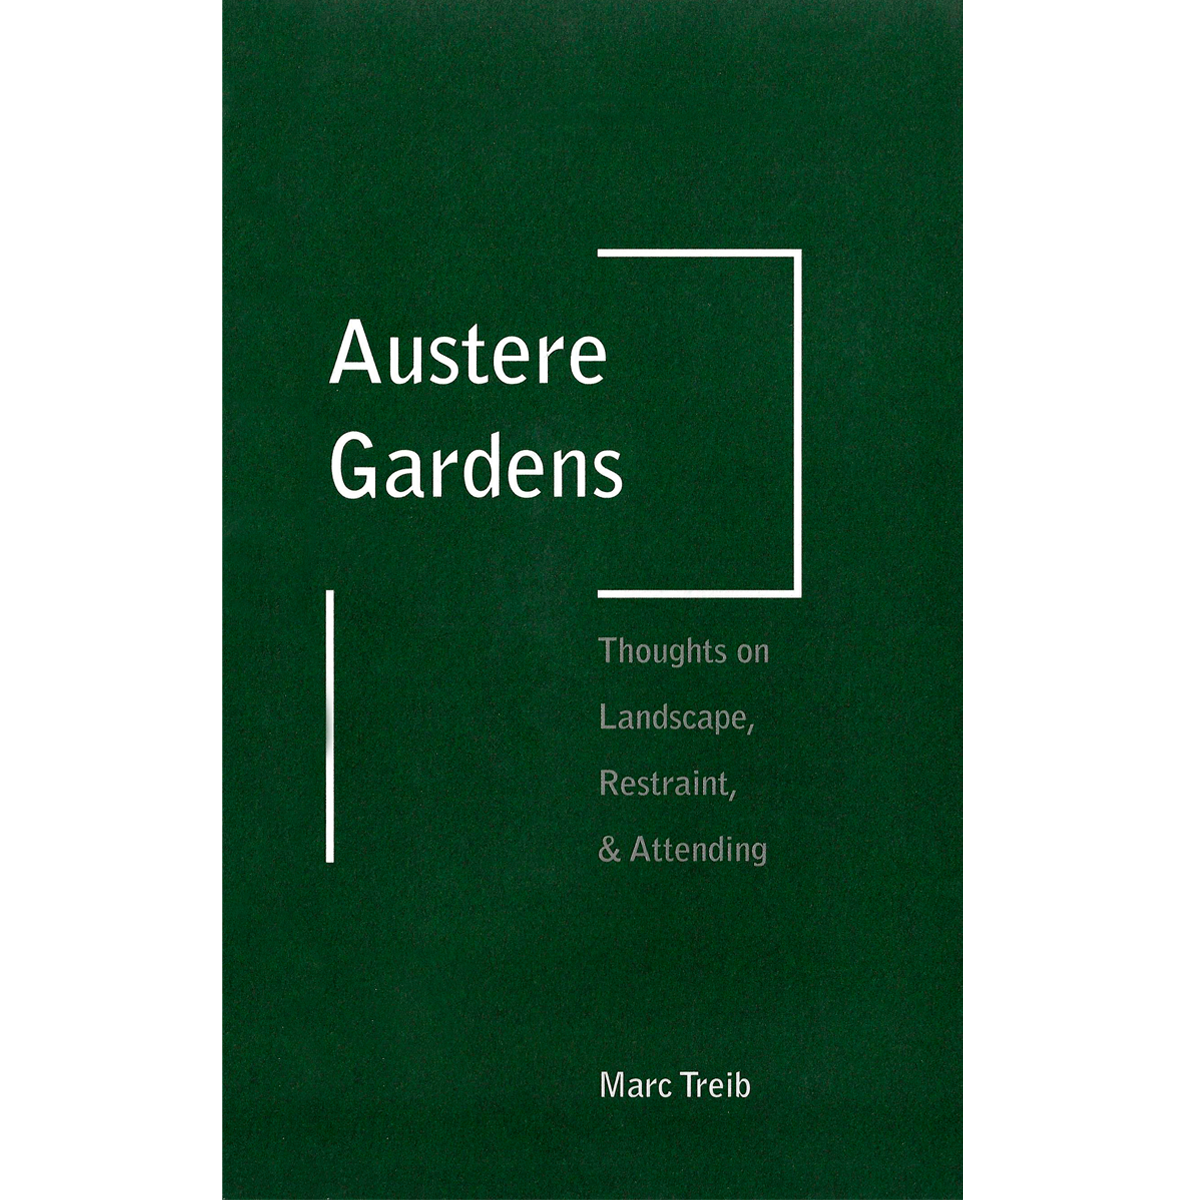 Austere Gardens